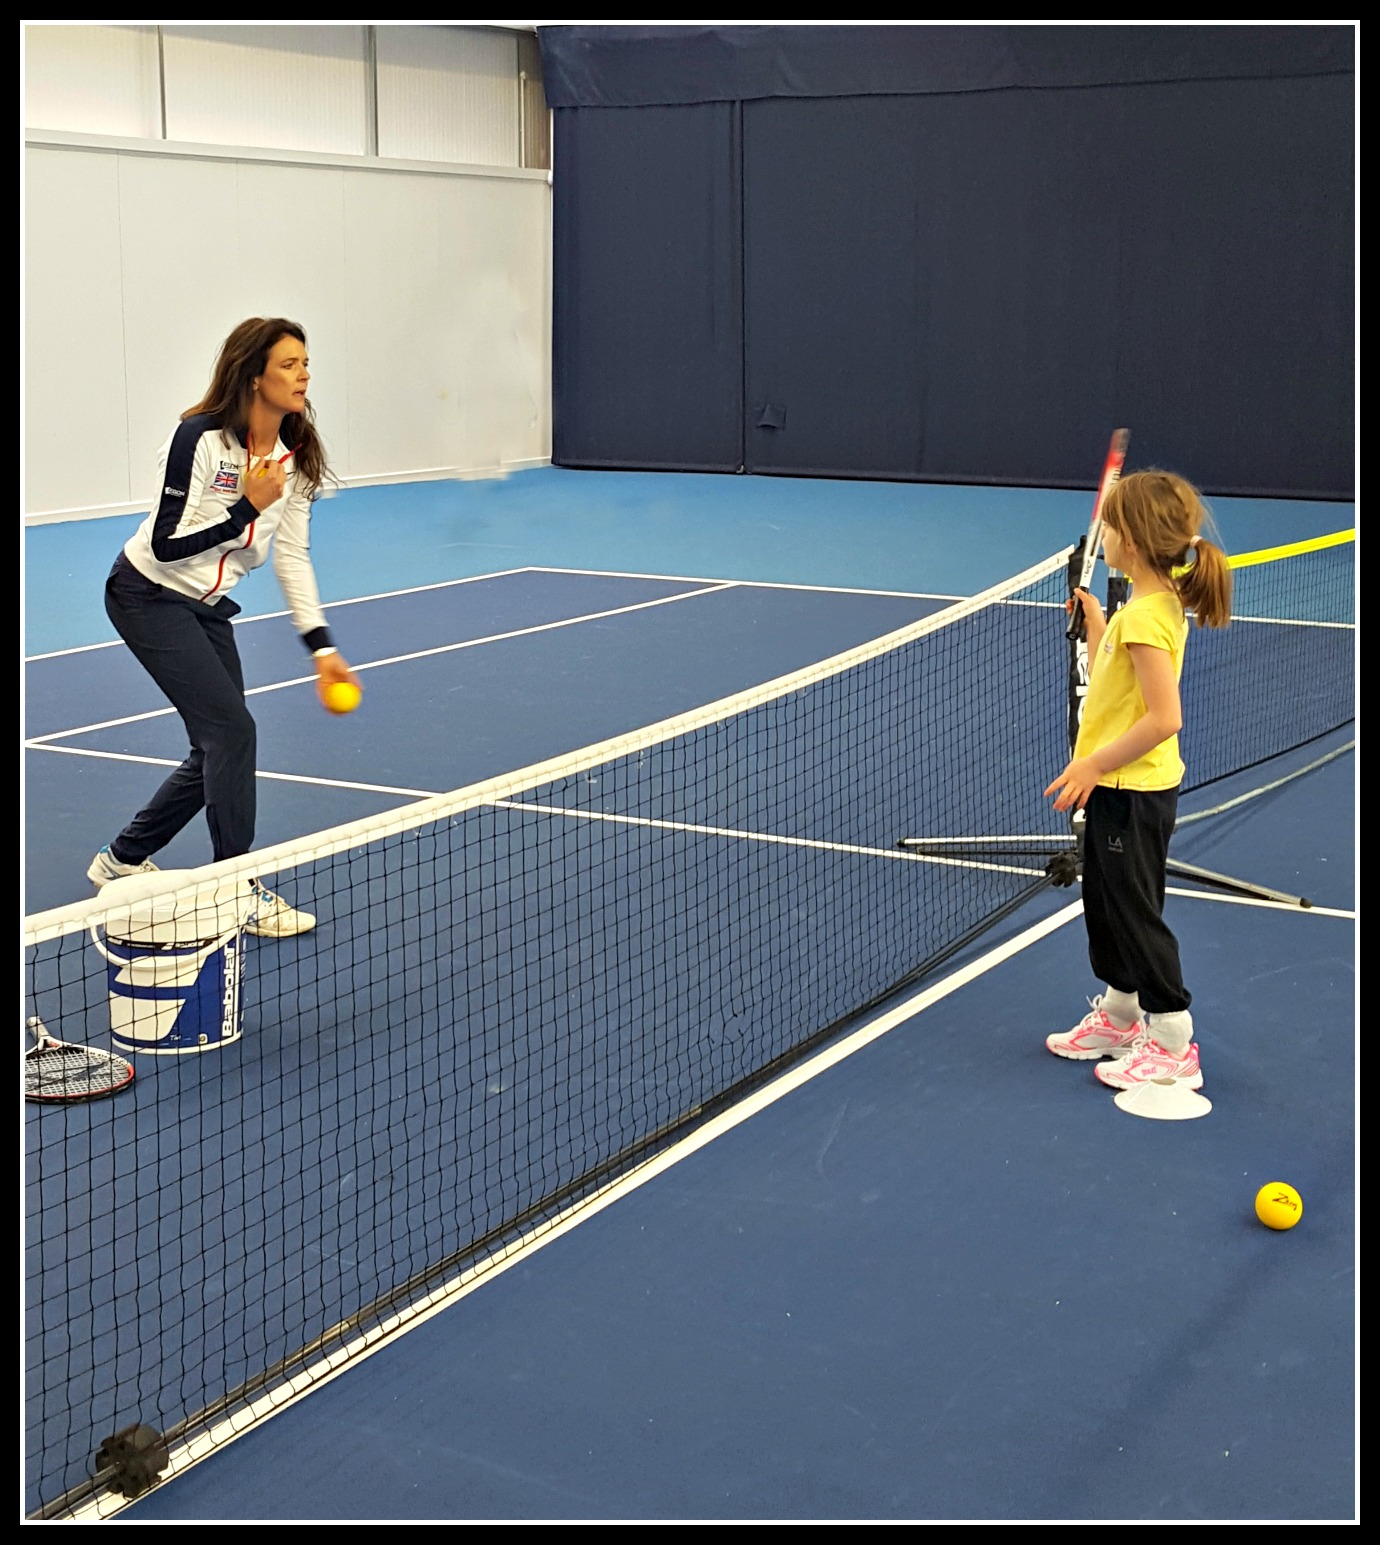 tennis, David Cup, Annabel Croft, Andy Murray, Jamie Murray